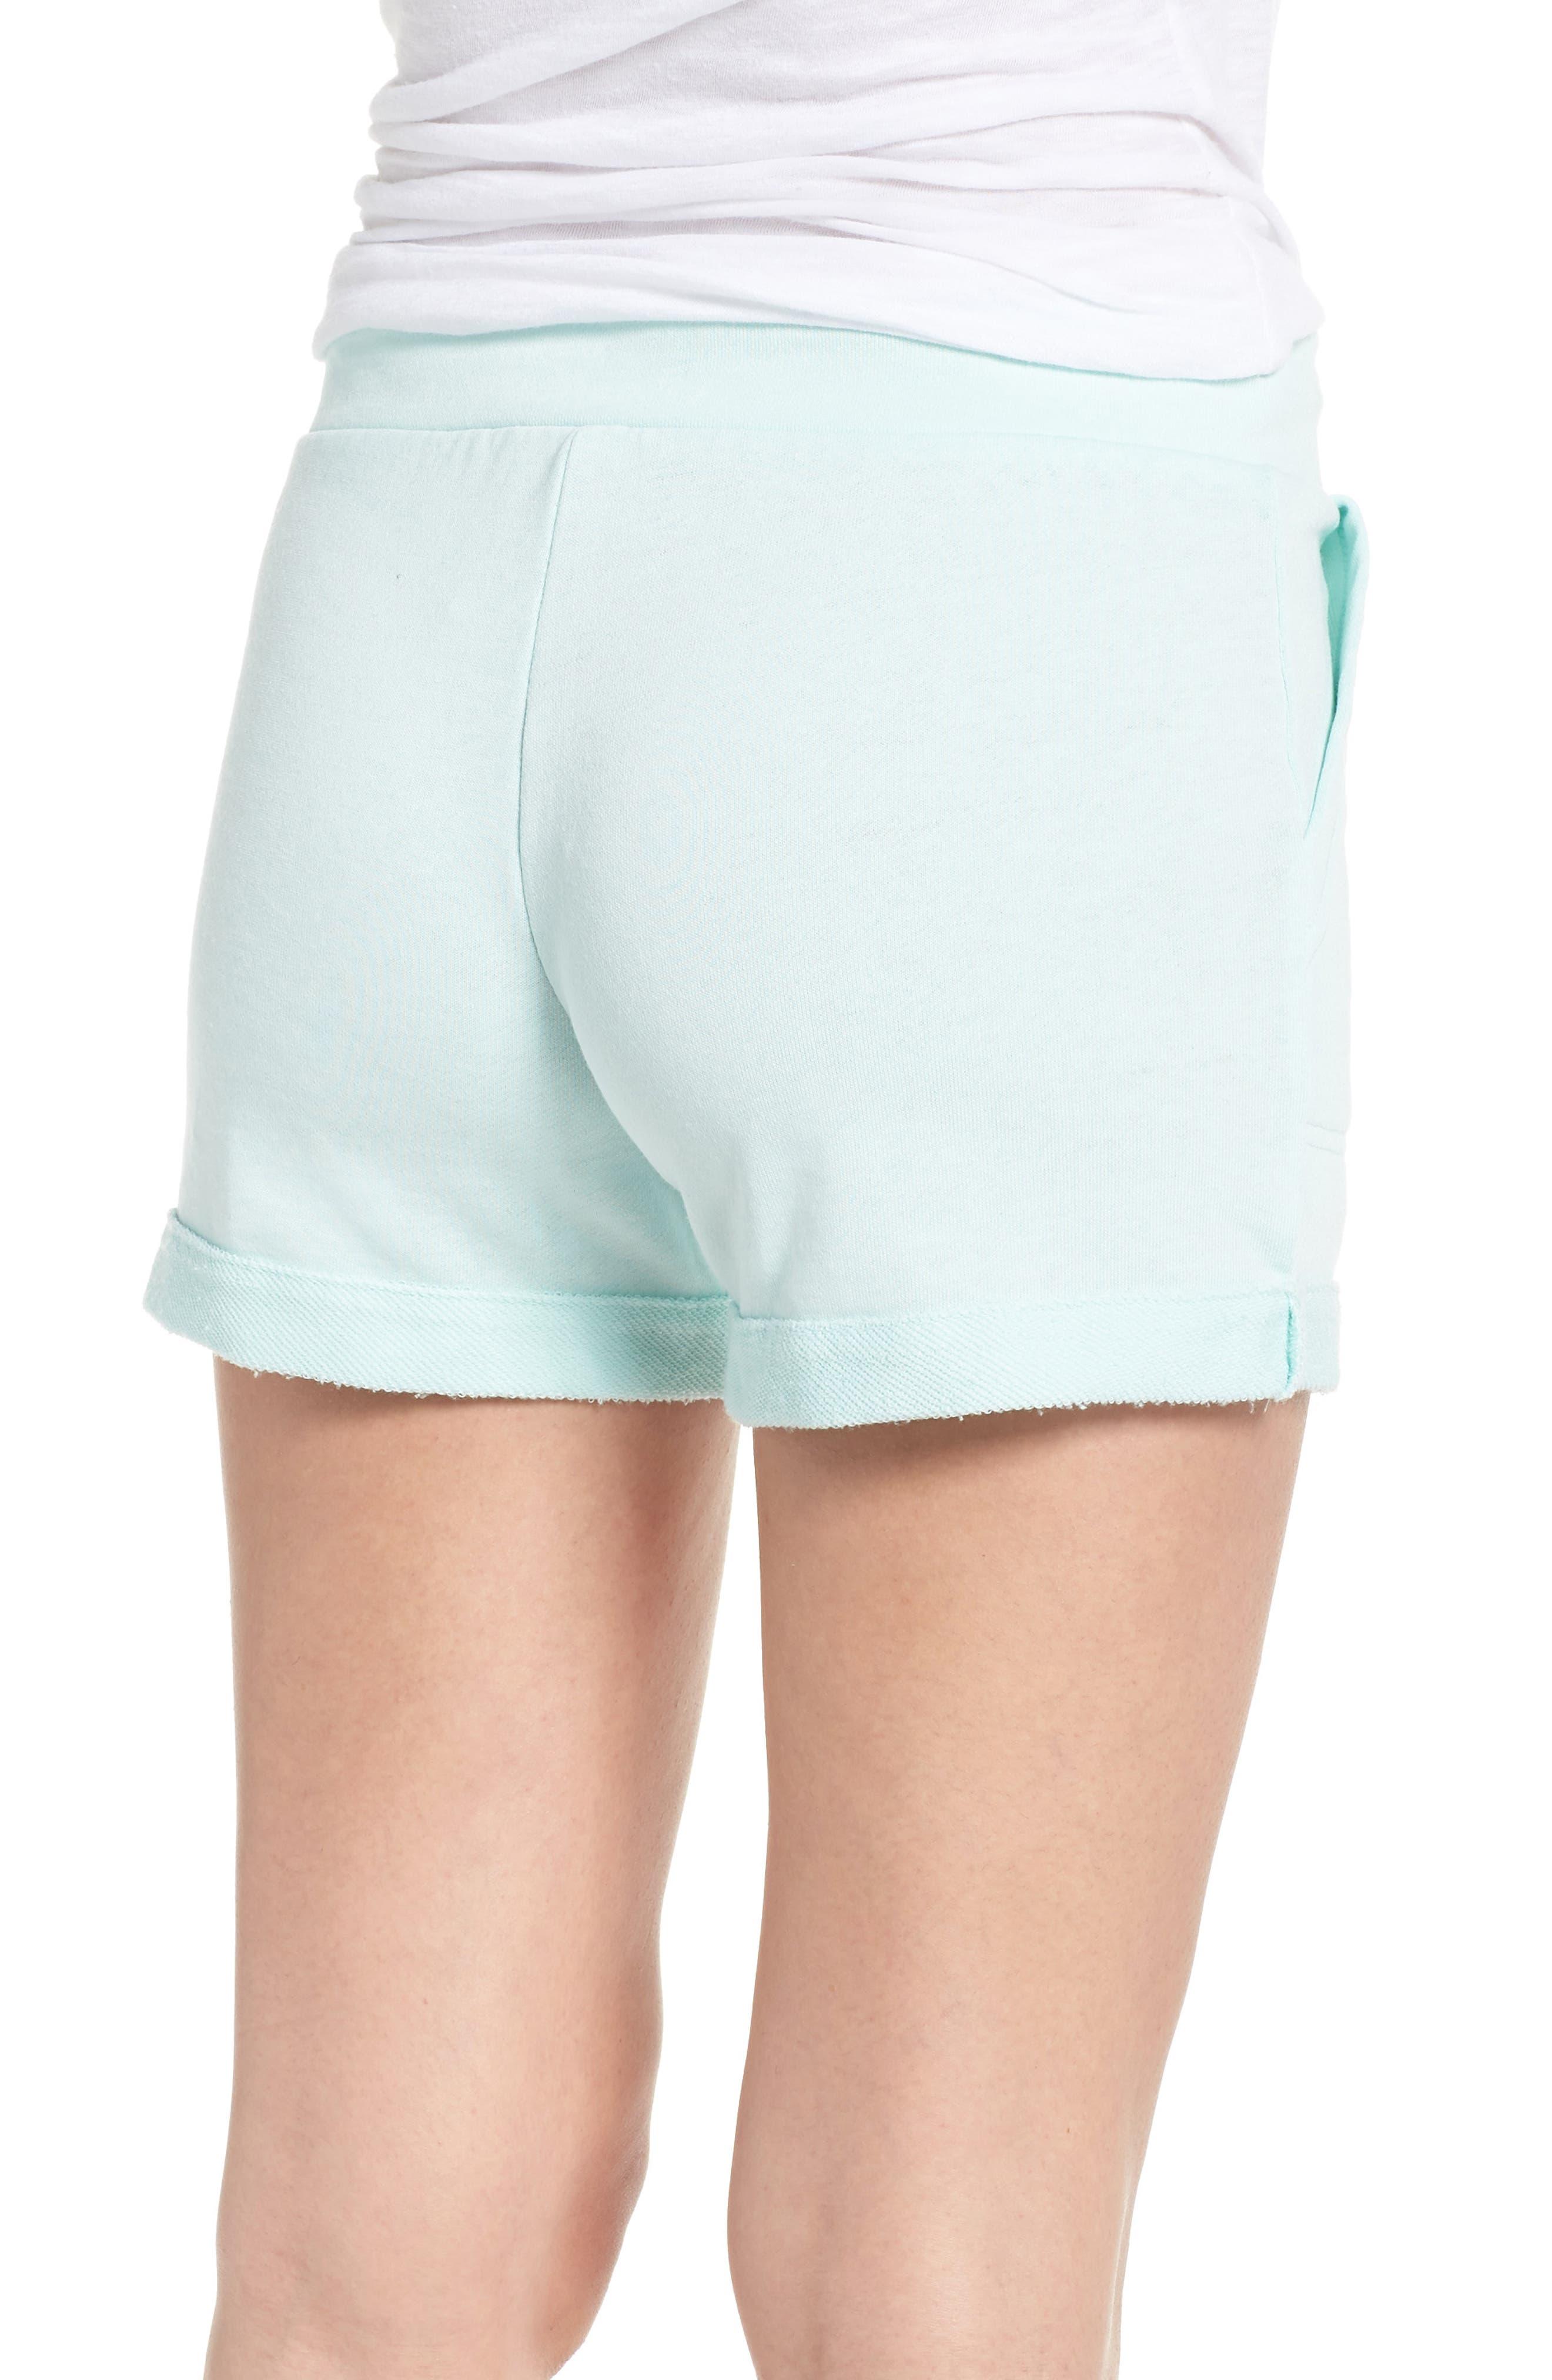 Lounge Shorts,                             Alternate thumbnail 2, color,                             300